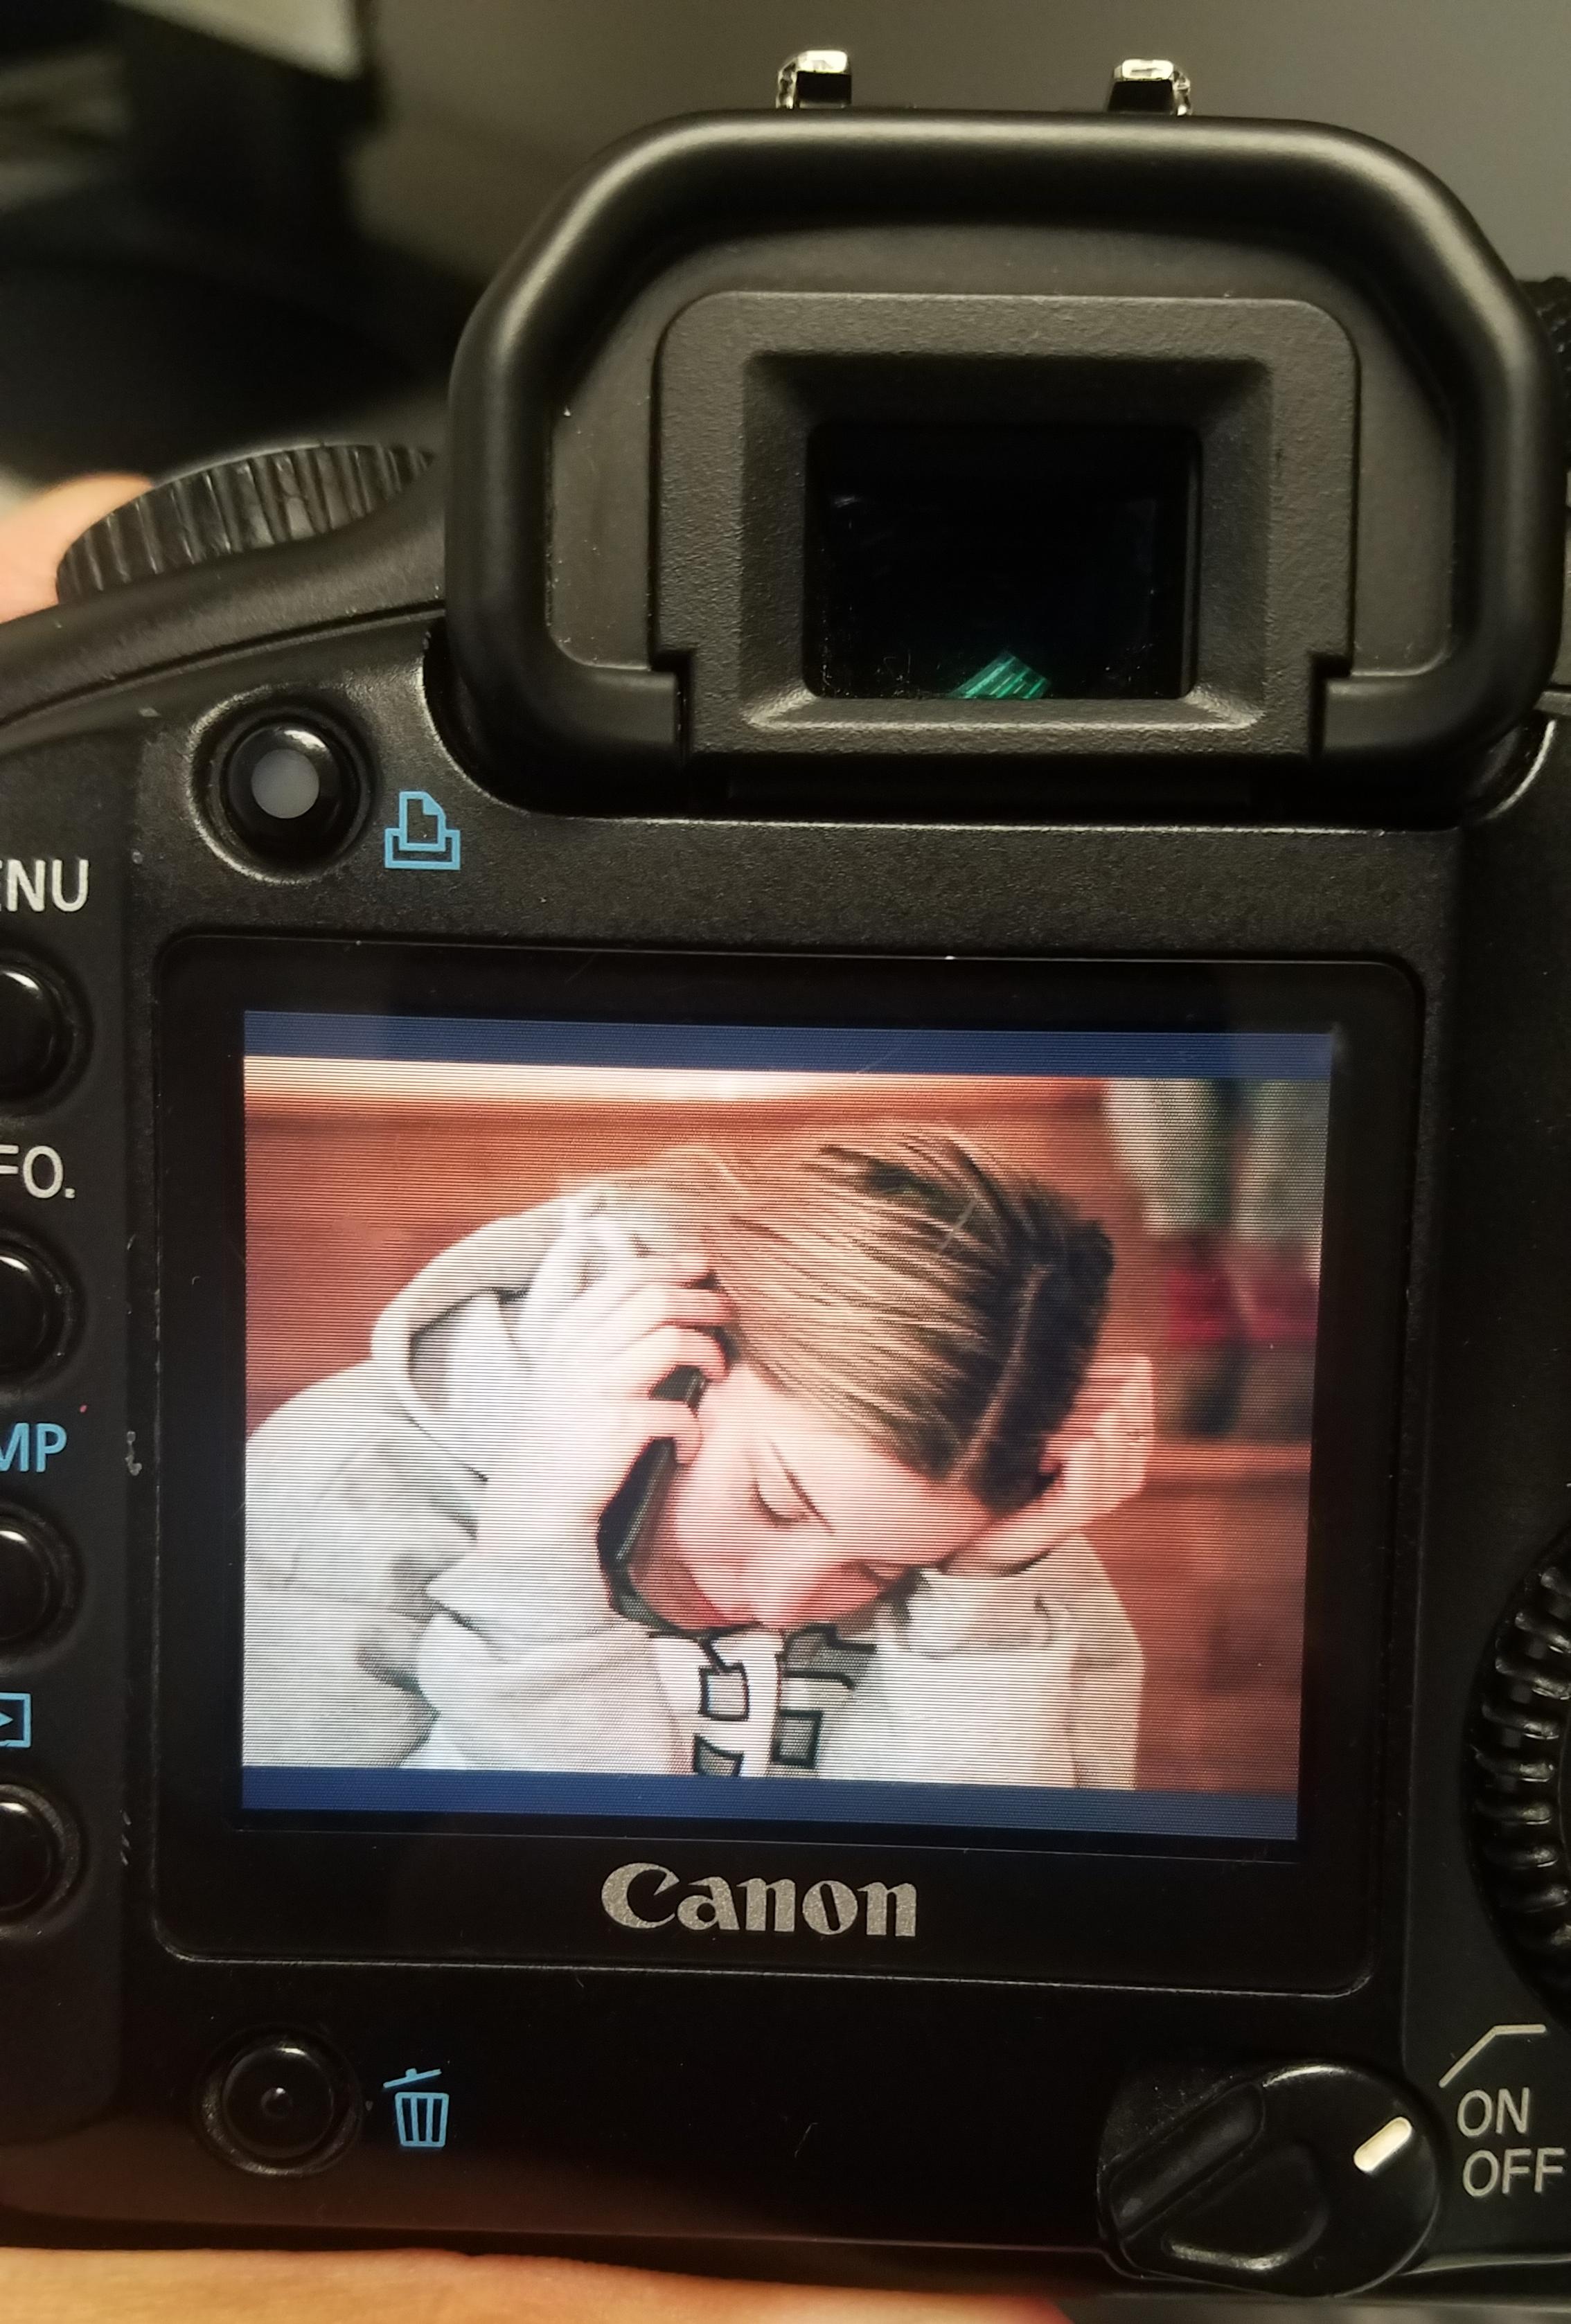 Canon LCD display.jpg